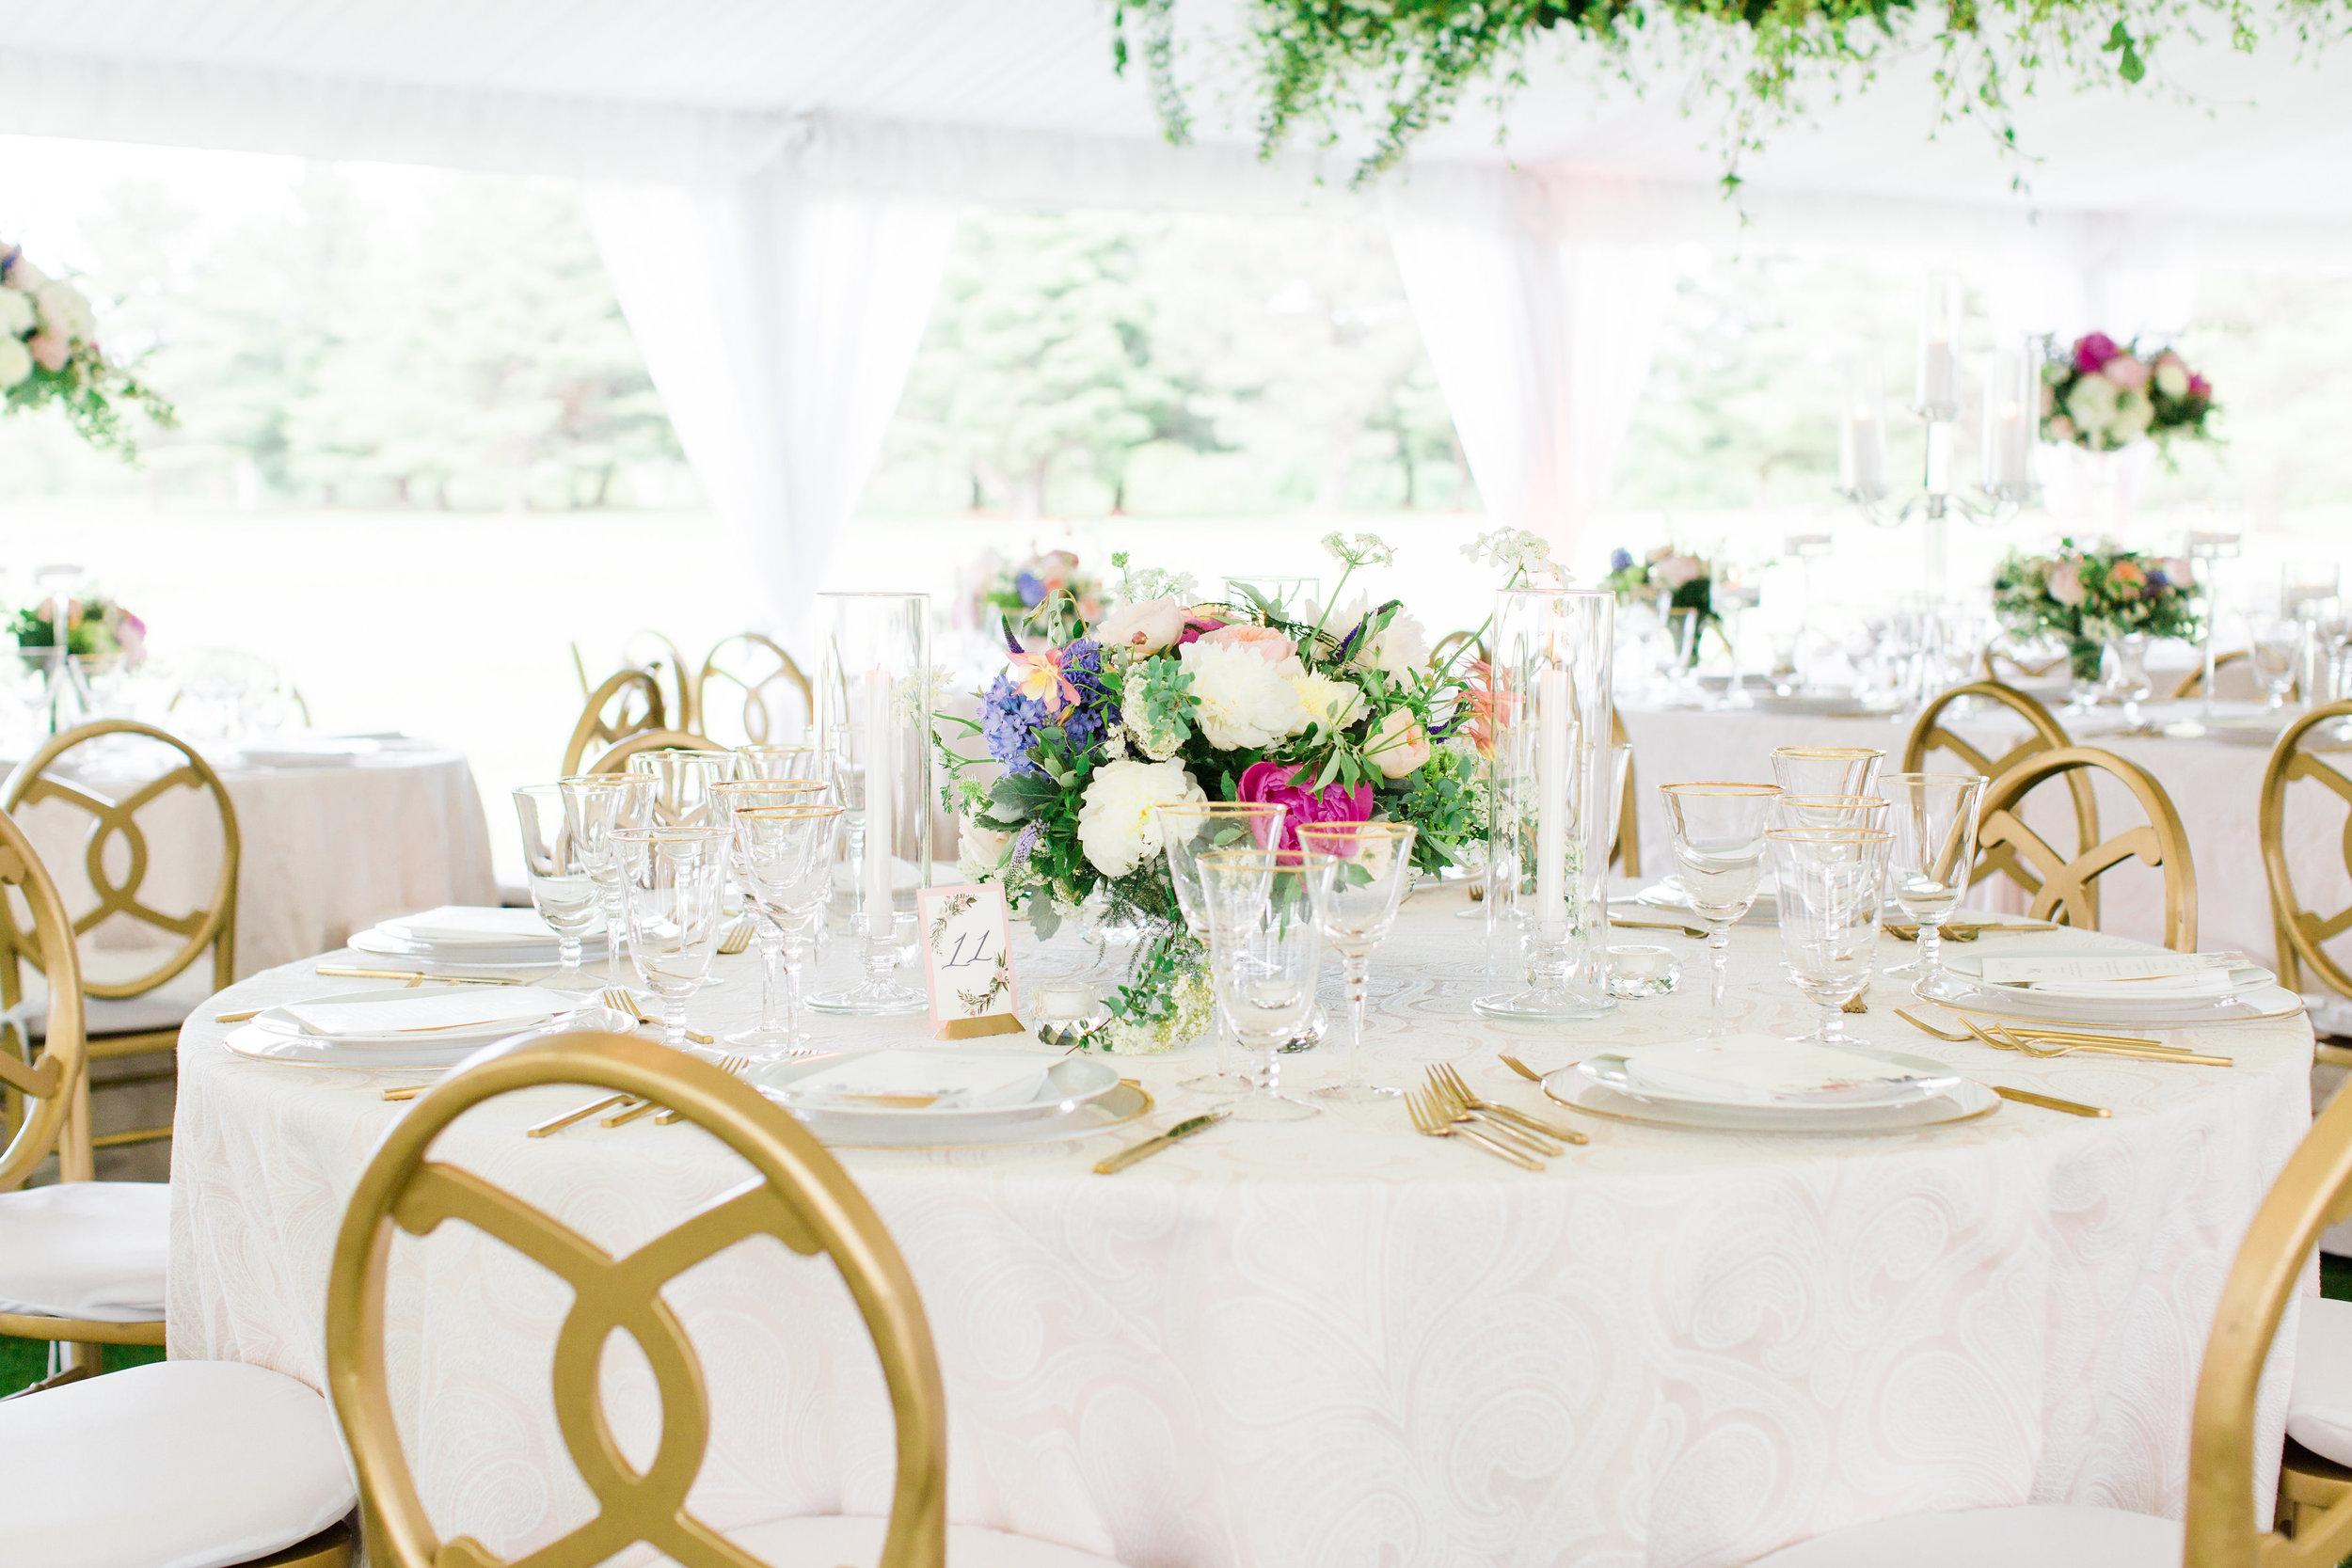 Coffman+Wedding+Reception+Details-41.jpg